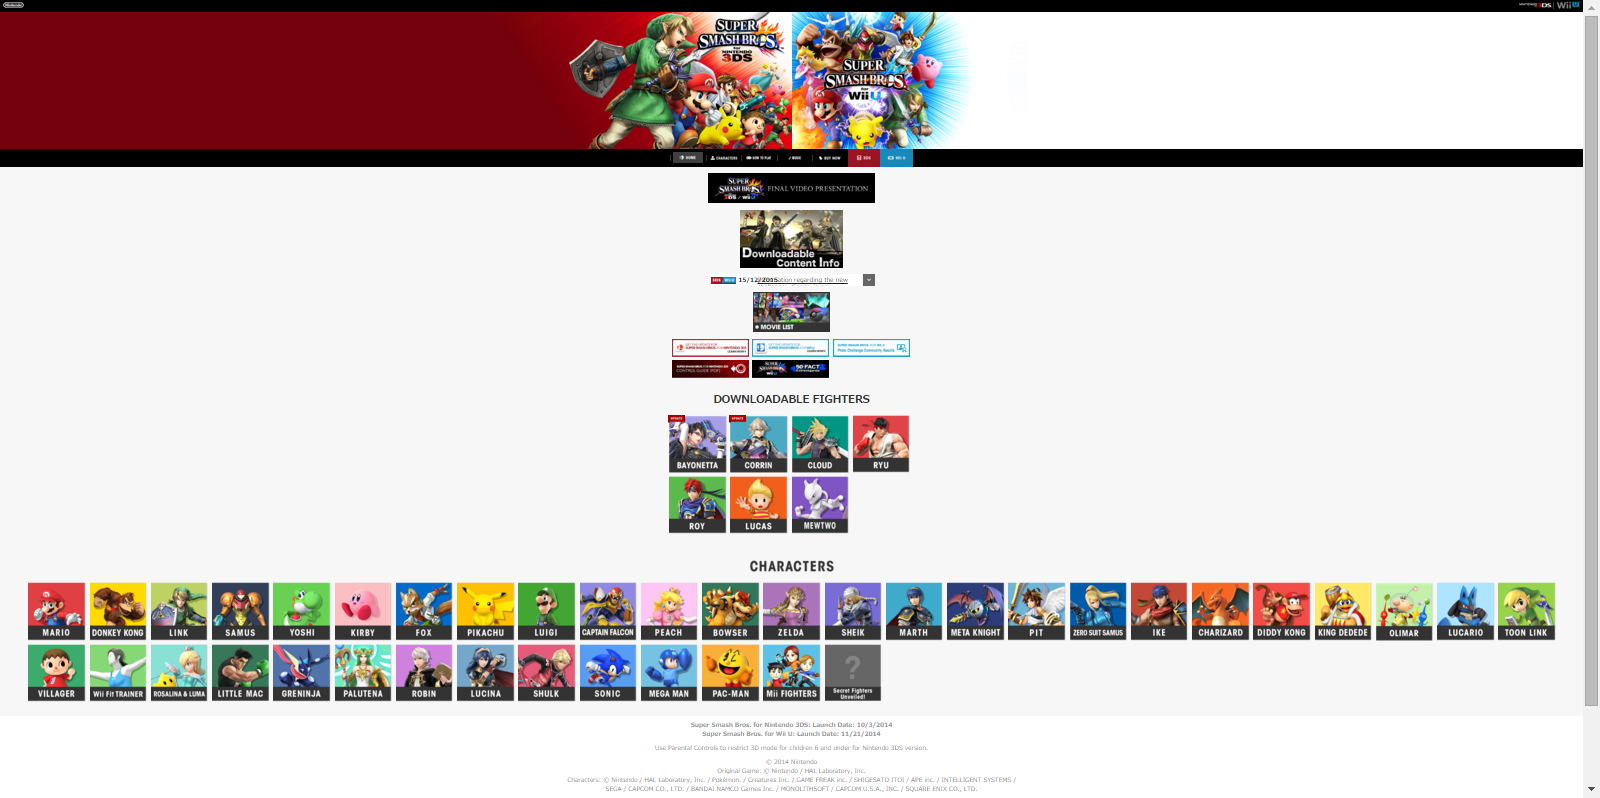 Super Smash Bros. for Nintendo 3DS and Wii U Official Site